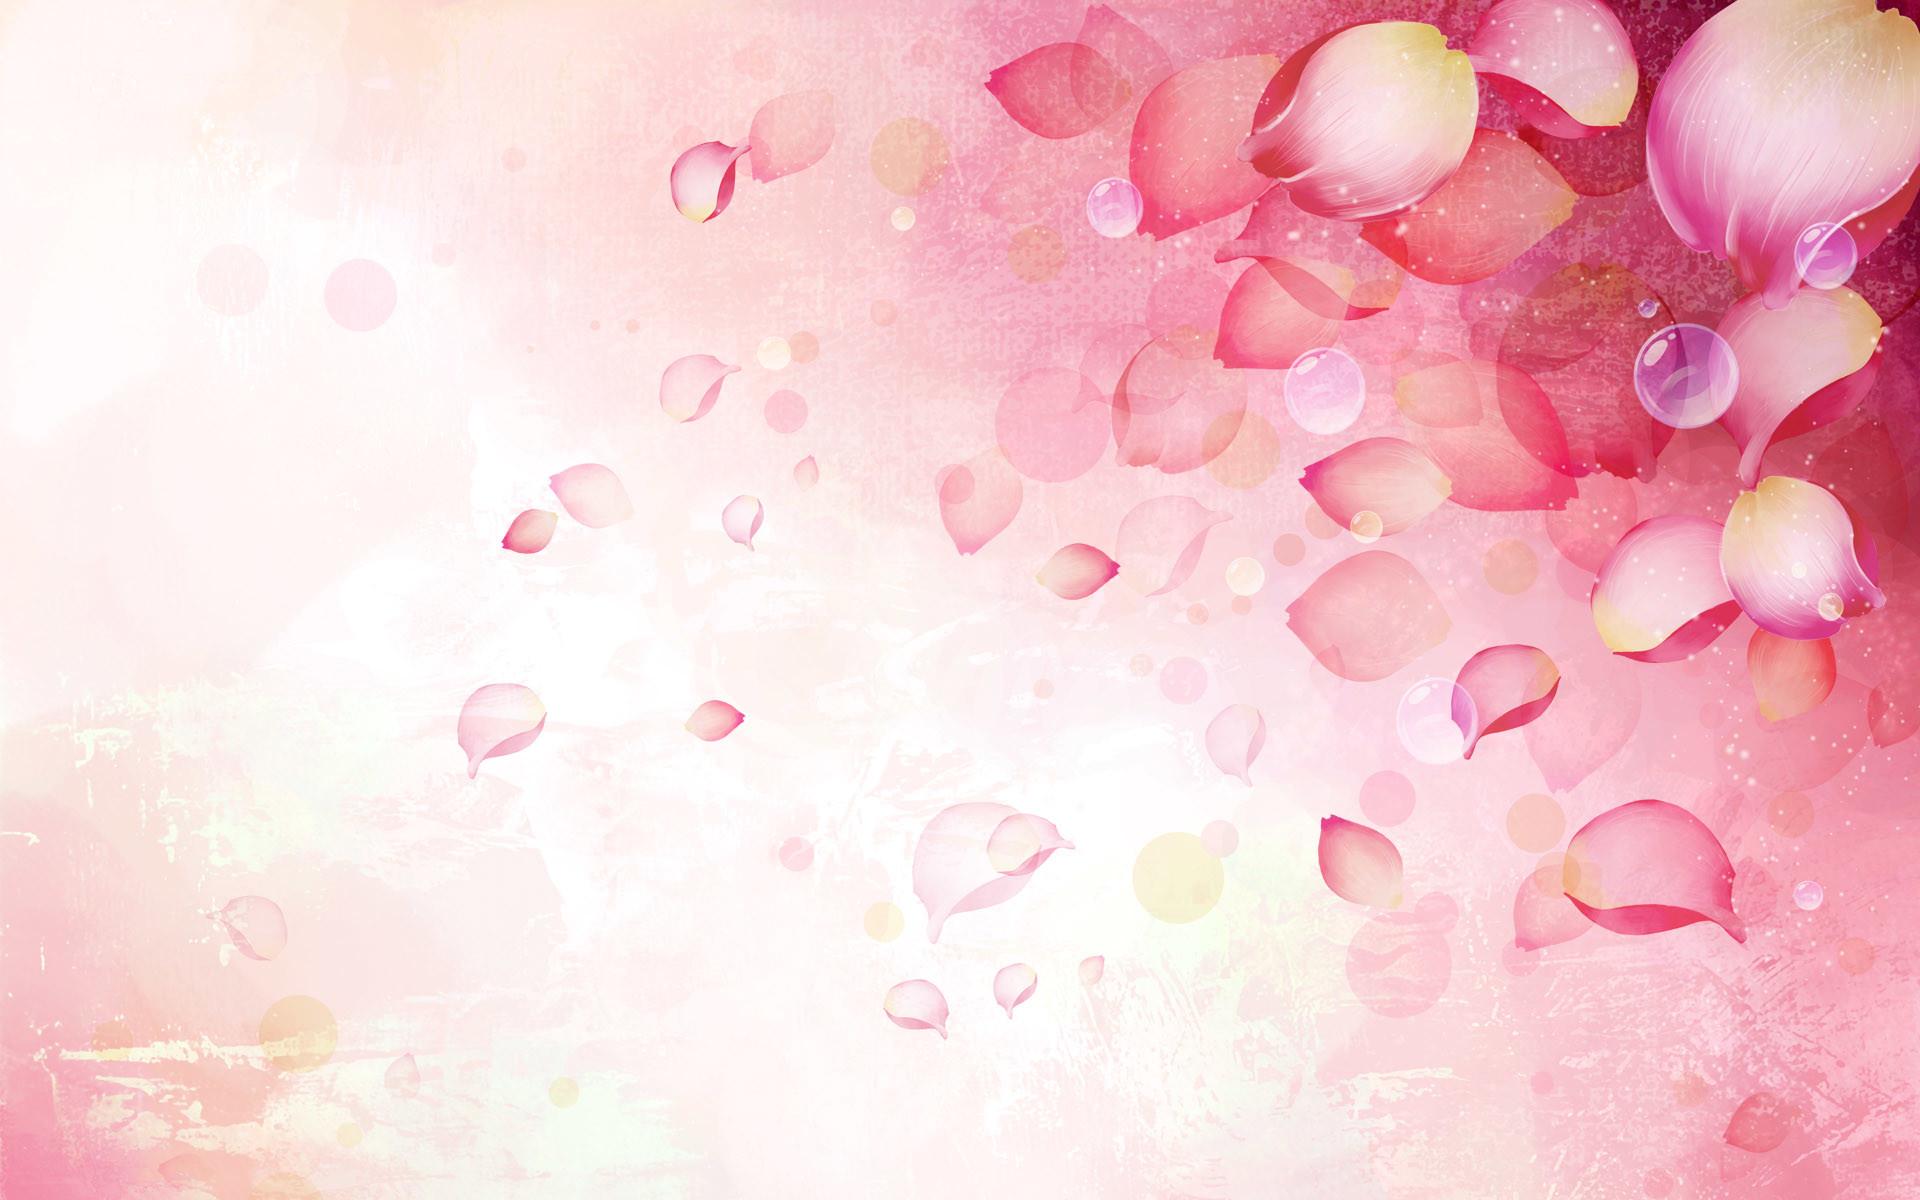 Pink flowers background bflower mightylinksfo Choice Image